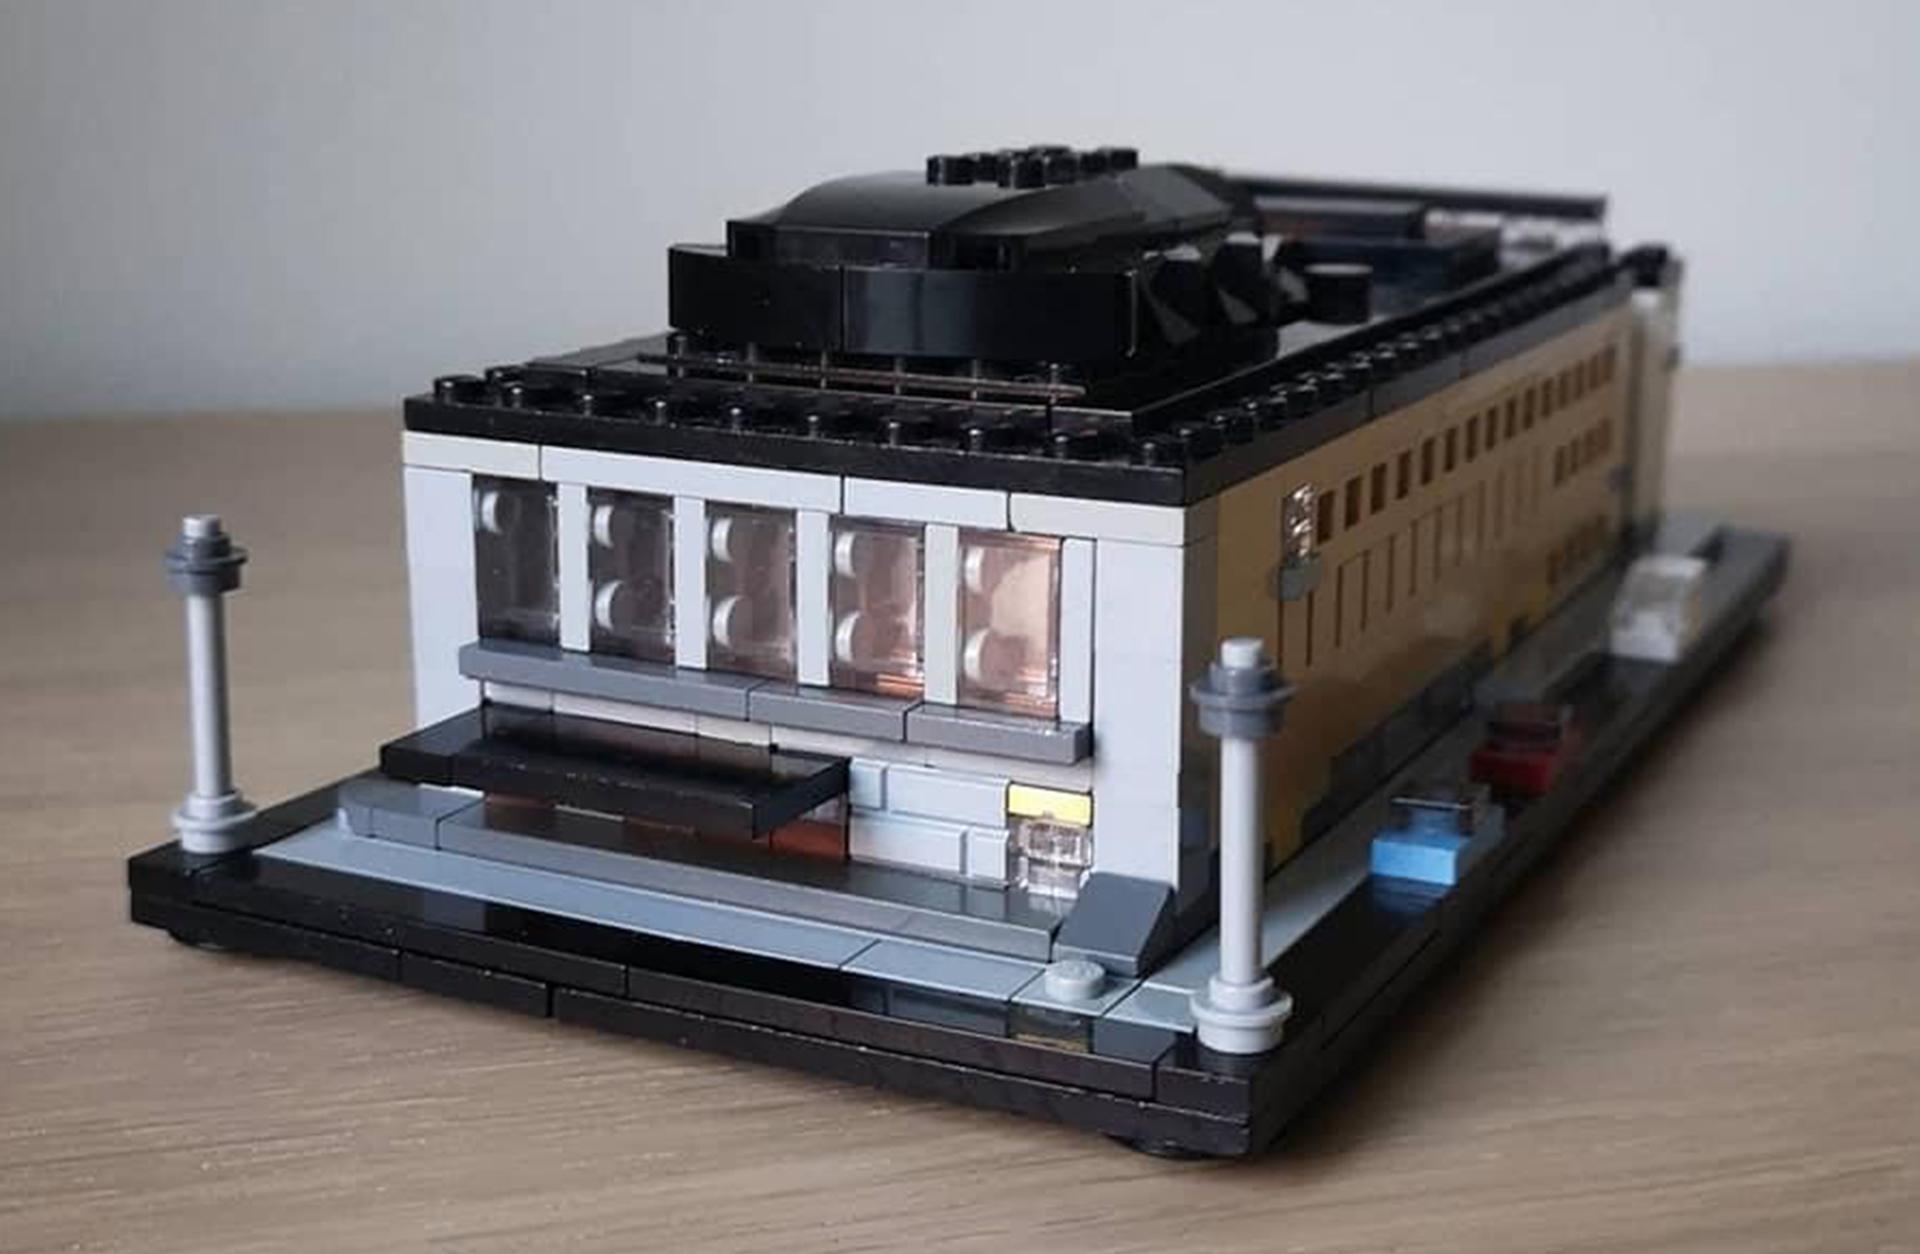 Göteborgs Konserthus byggt av Lego